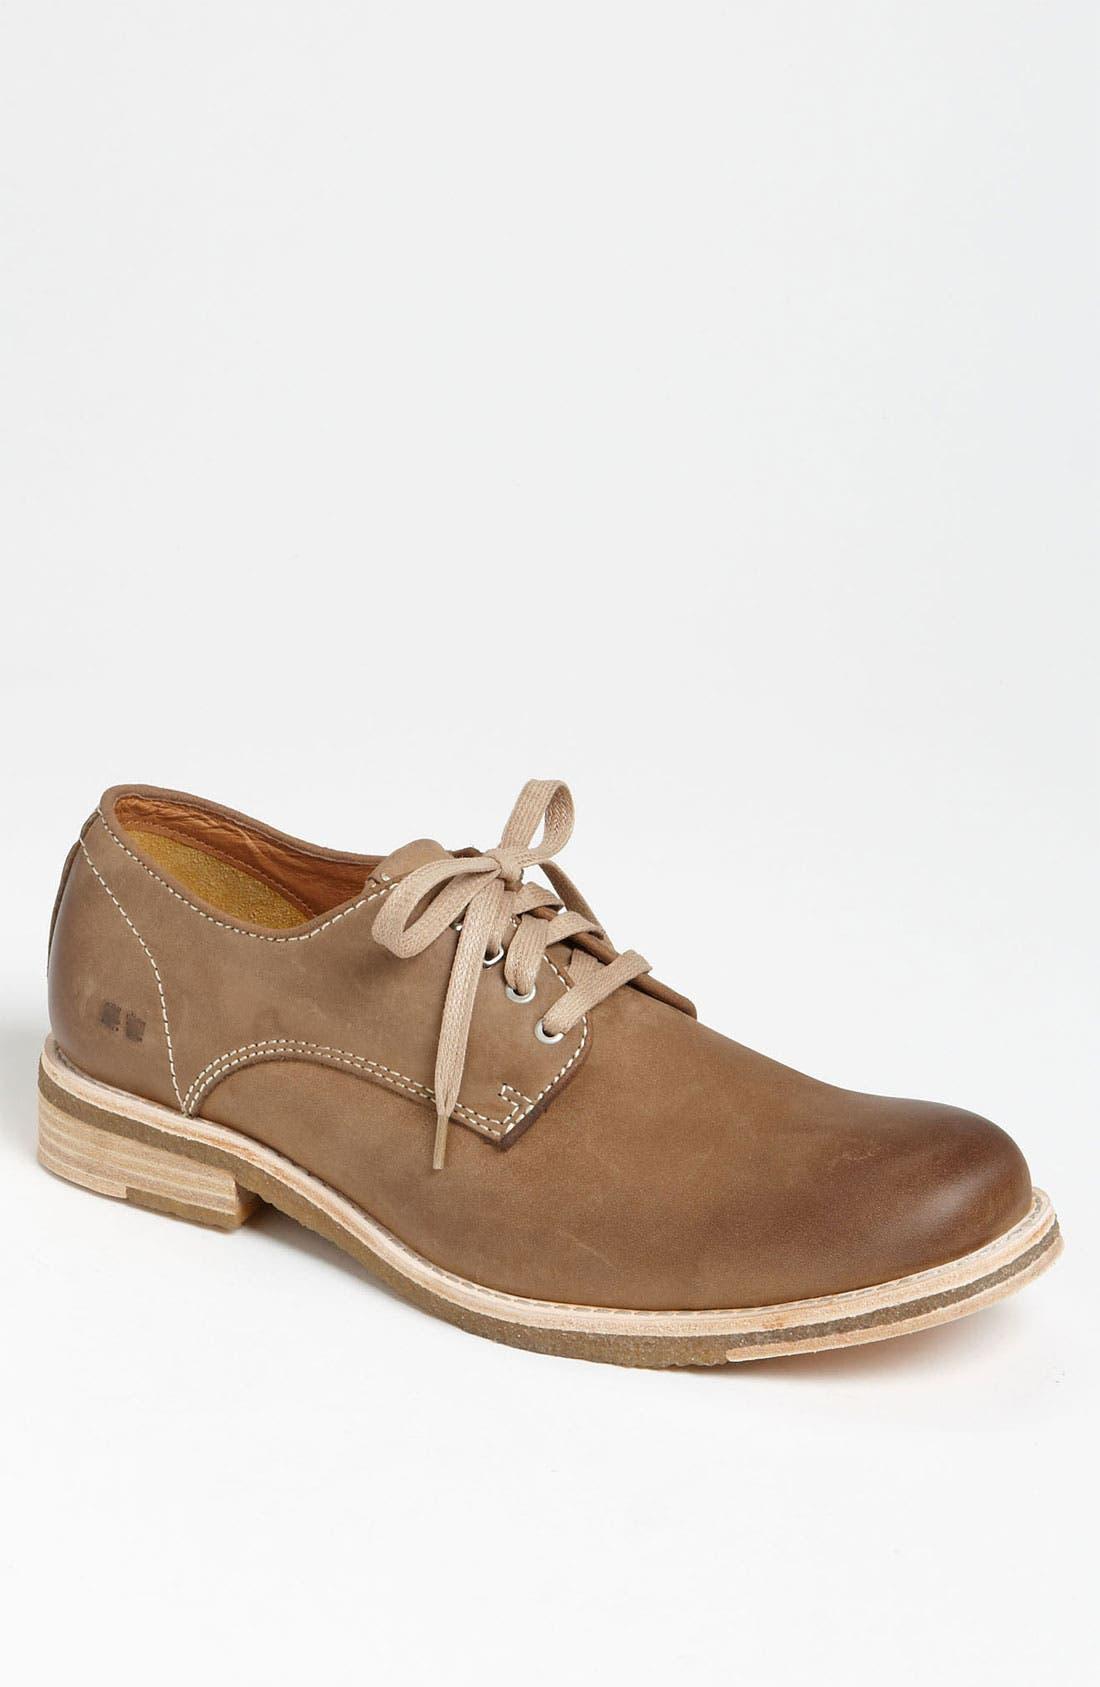 Alternate Image 1 Selected - Bed Stu 'Pennyworth' Buck Shoe